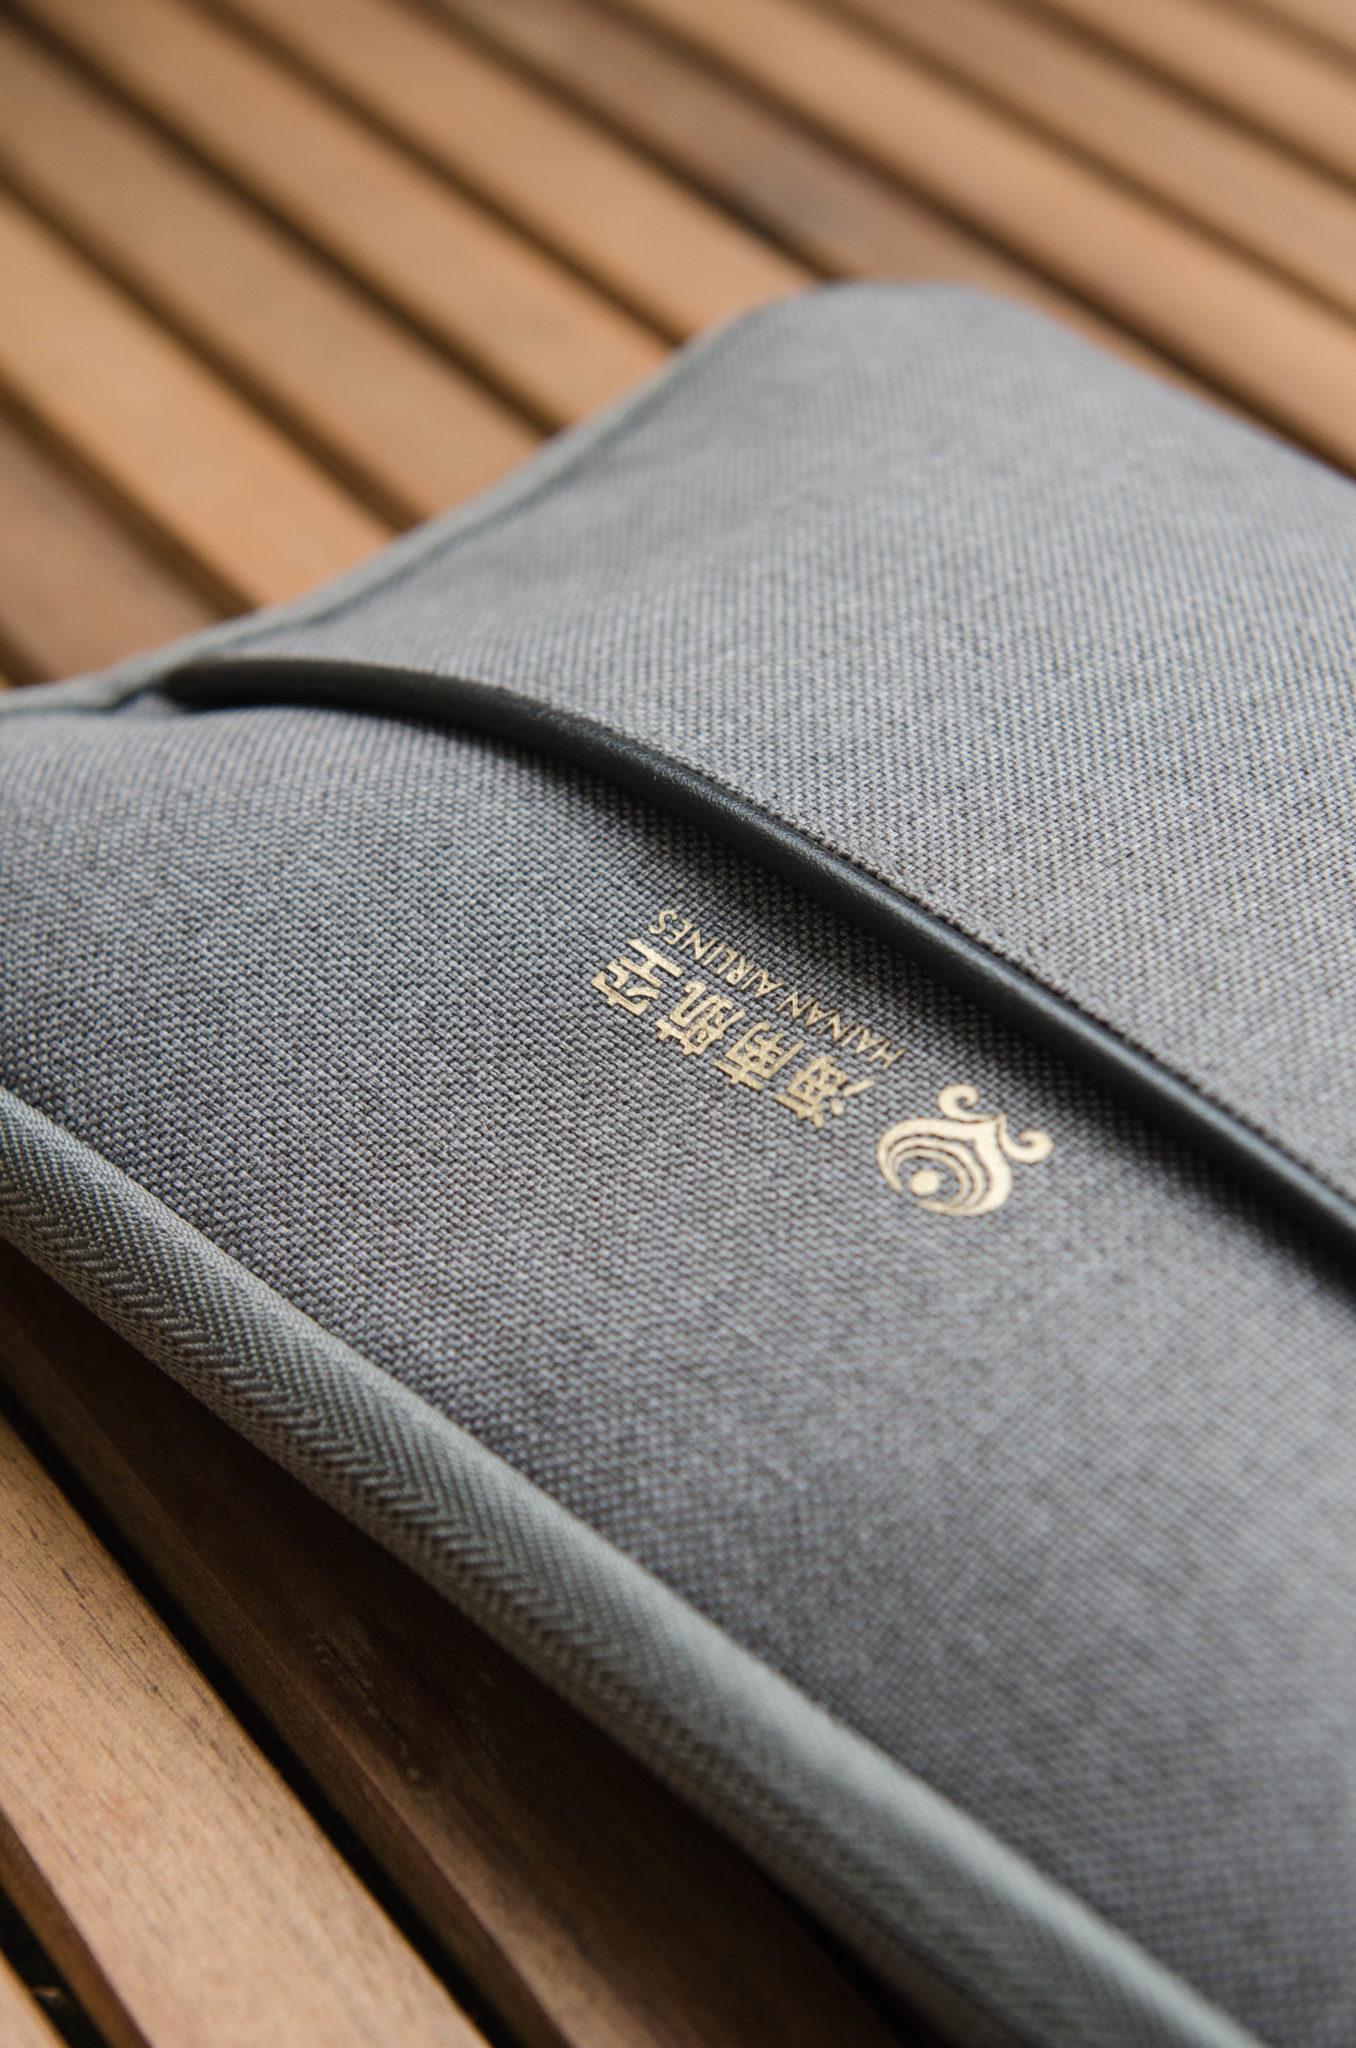 In dem Amenity Kit der Hainan Business Class ist alles drin, was man benötigt